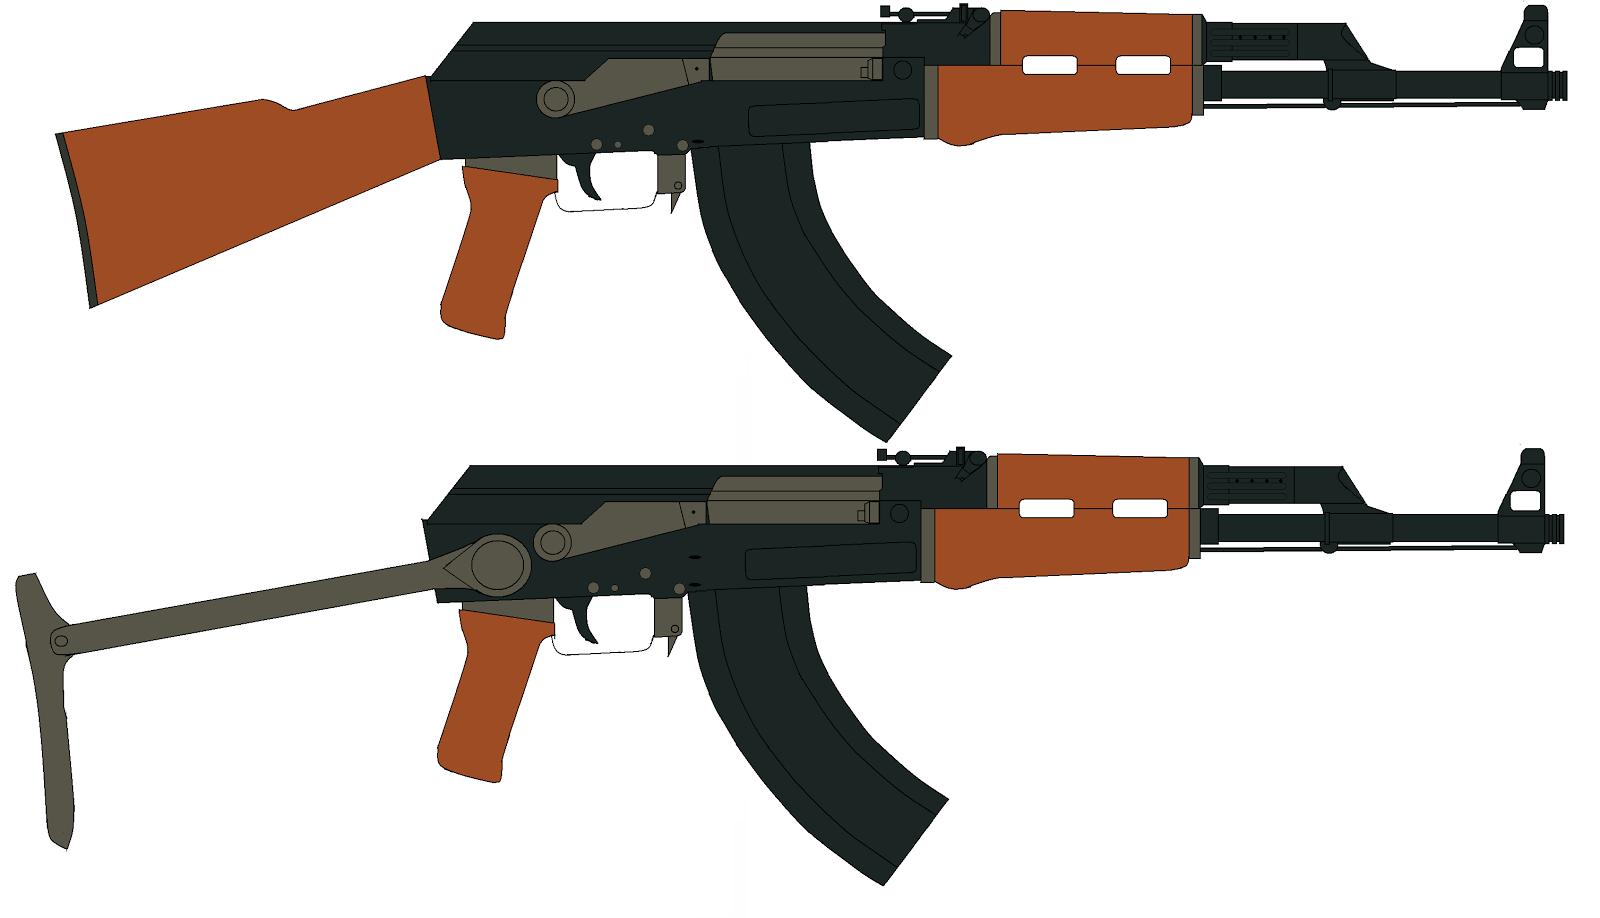 Chivo Dibujo Animado: AK 47: Un Arma Que Hizo Historia